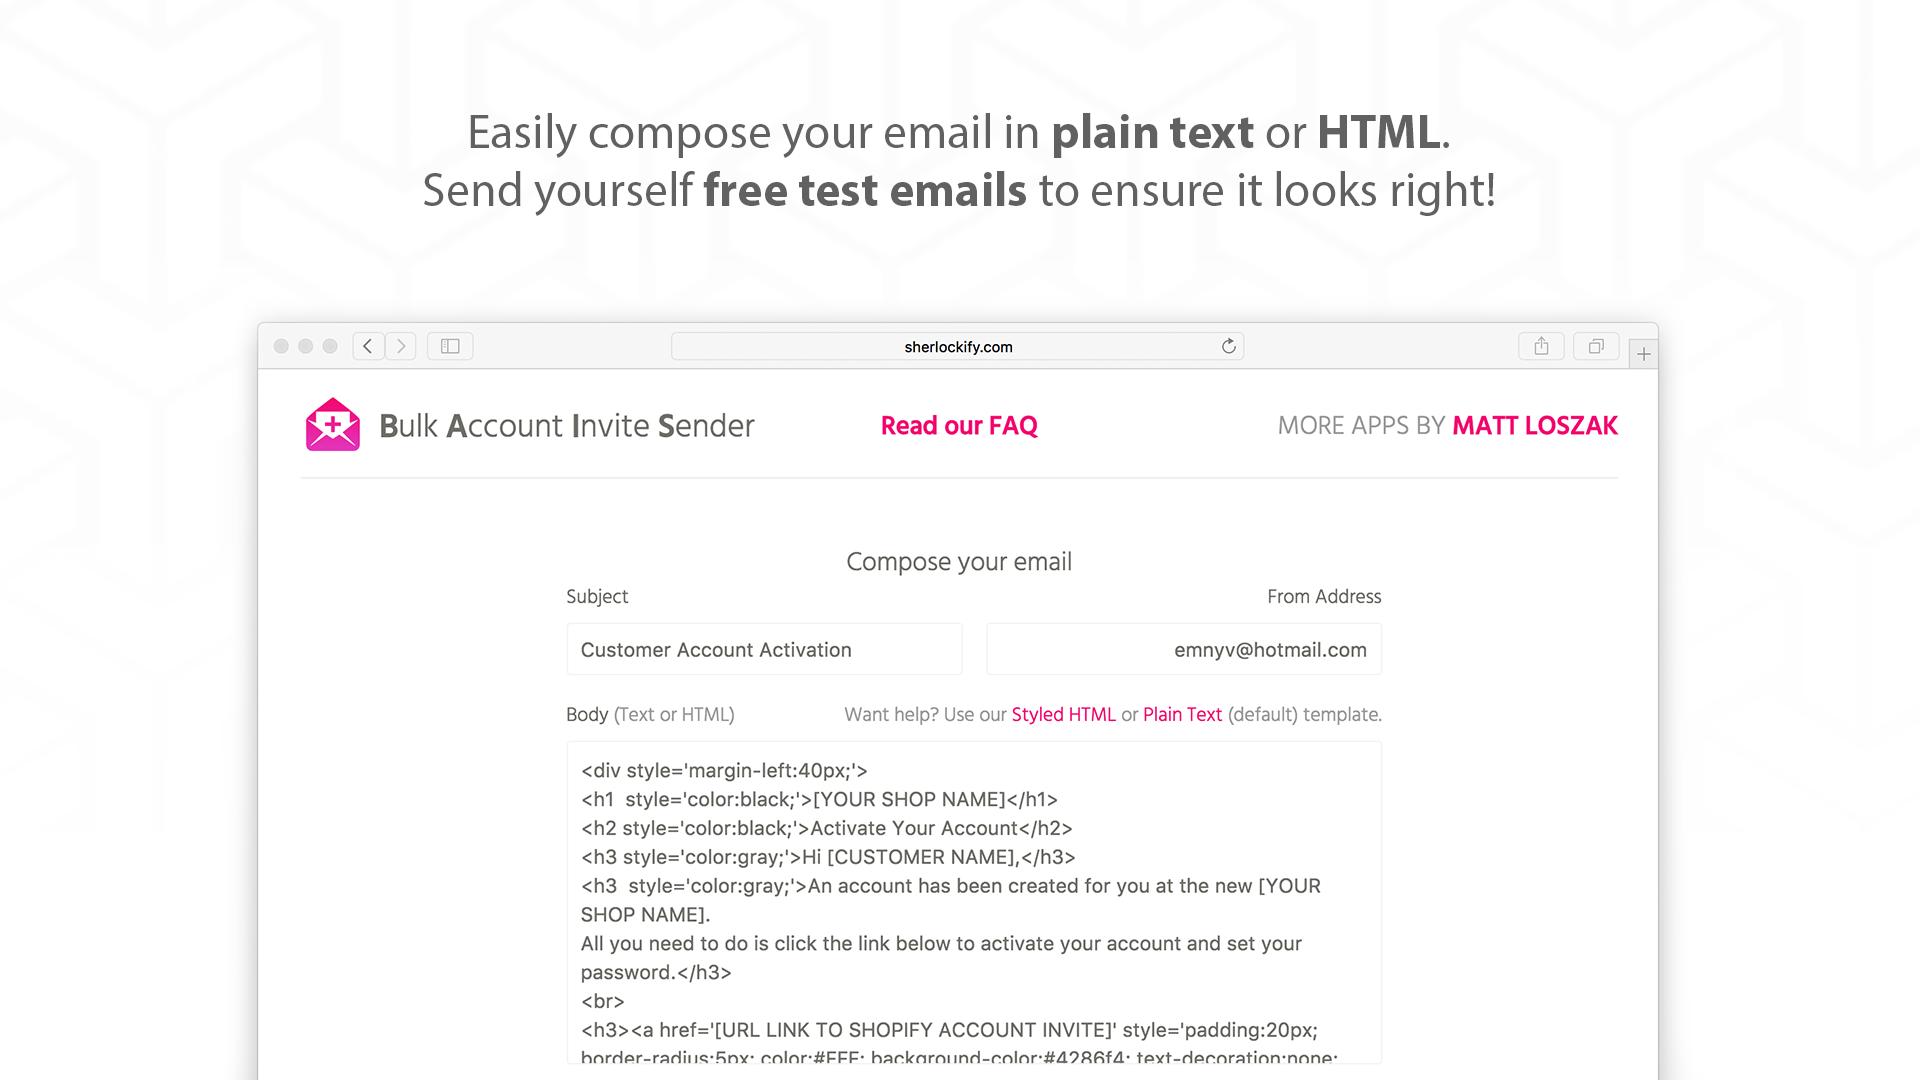 Shop customer account create/ - Screenshots